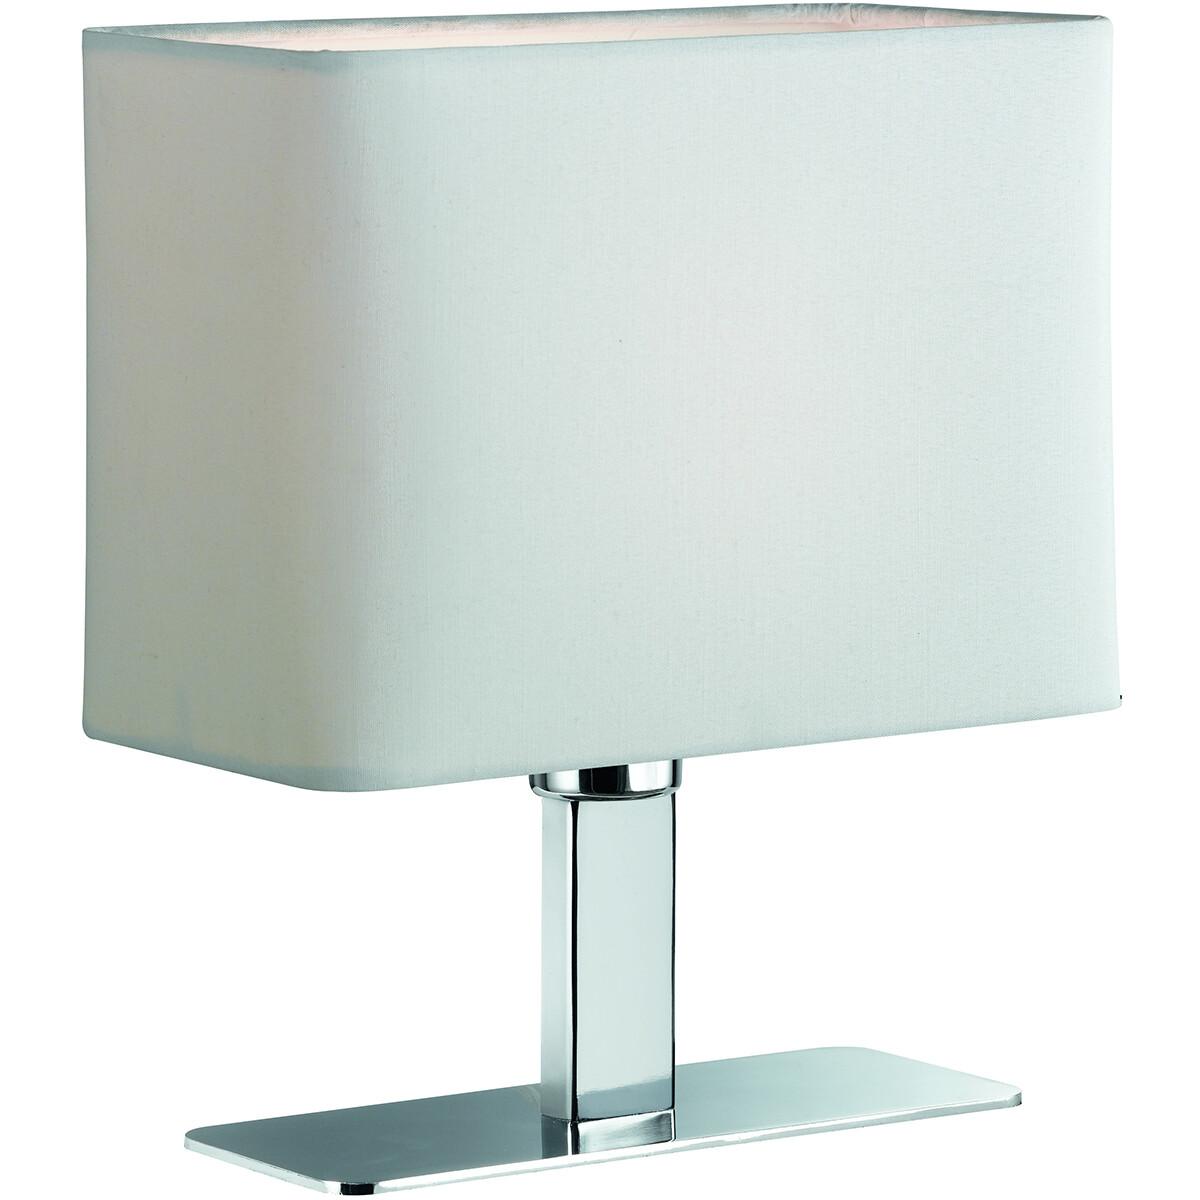 LED Tafellamp - Tafelverlichting - Trion Migon - E14 Fitting - Rechthoek - Mat Wit - Aluminium